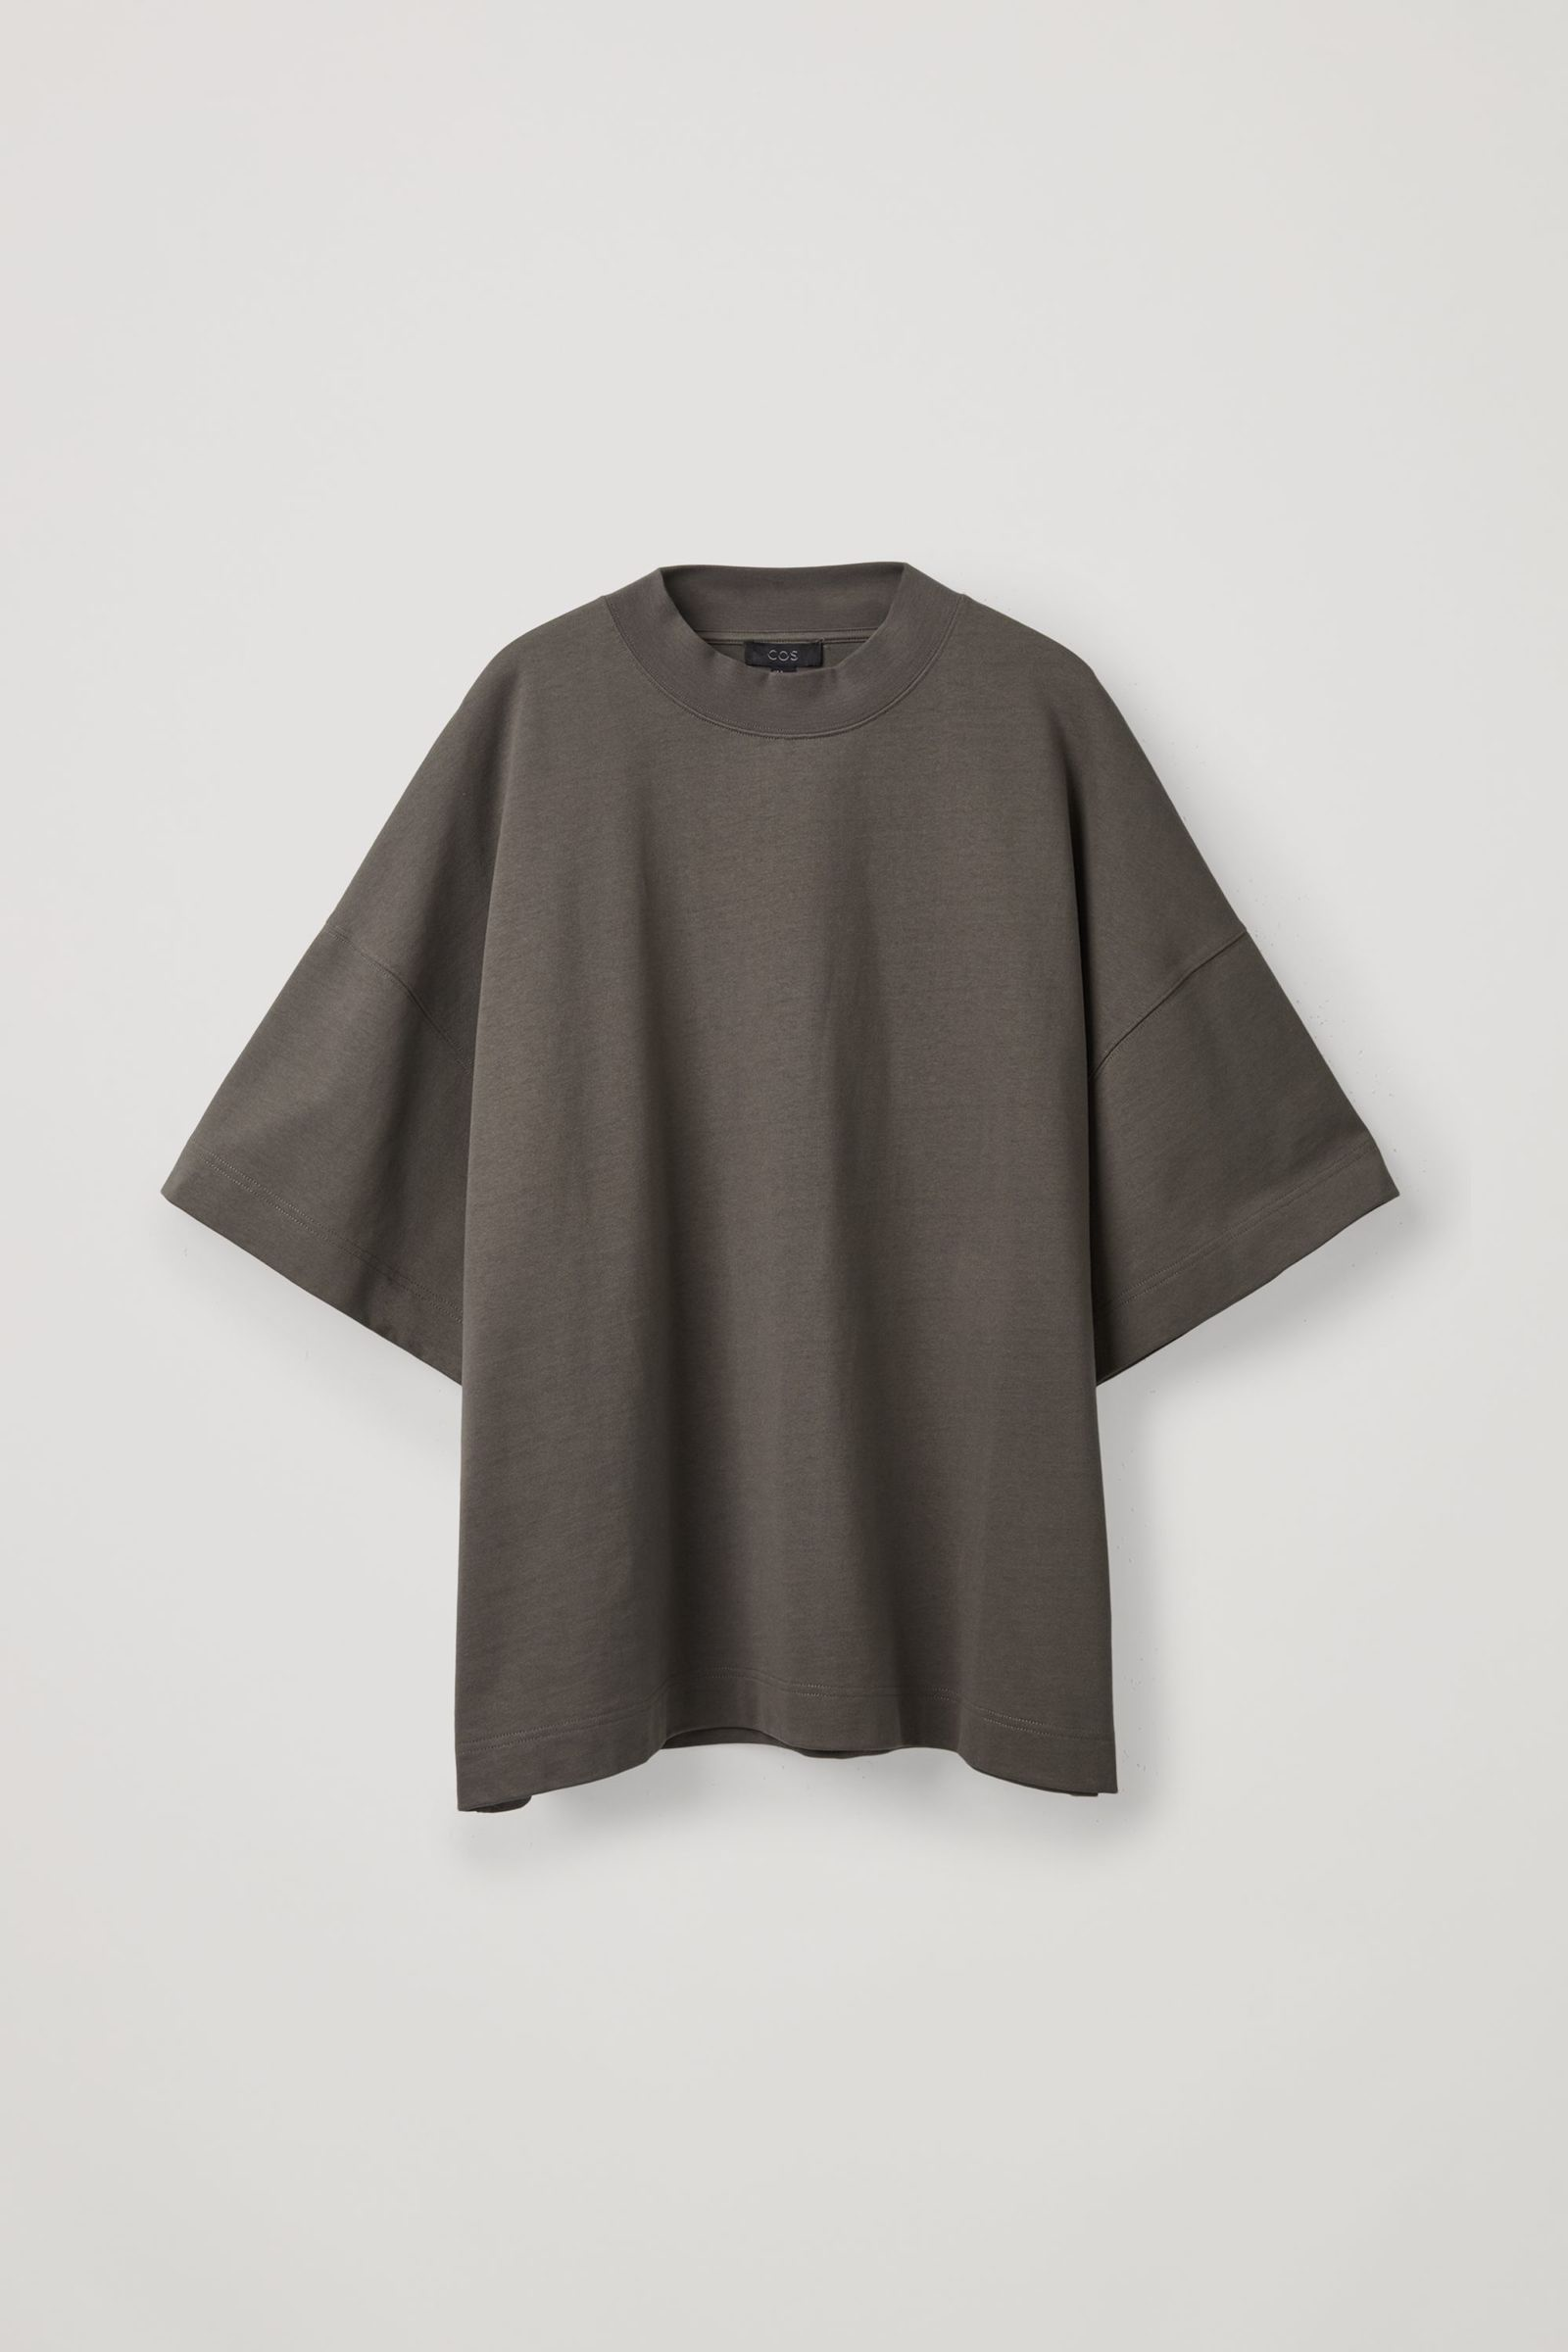 COS 숄더 드롭 티셔츠의 다크 그레이컬러 Product입니다.